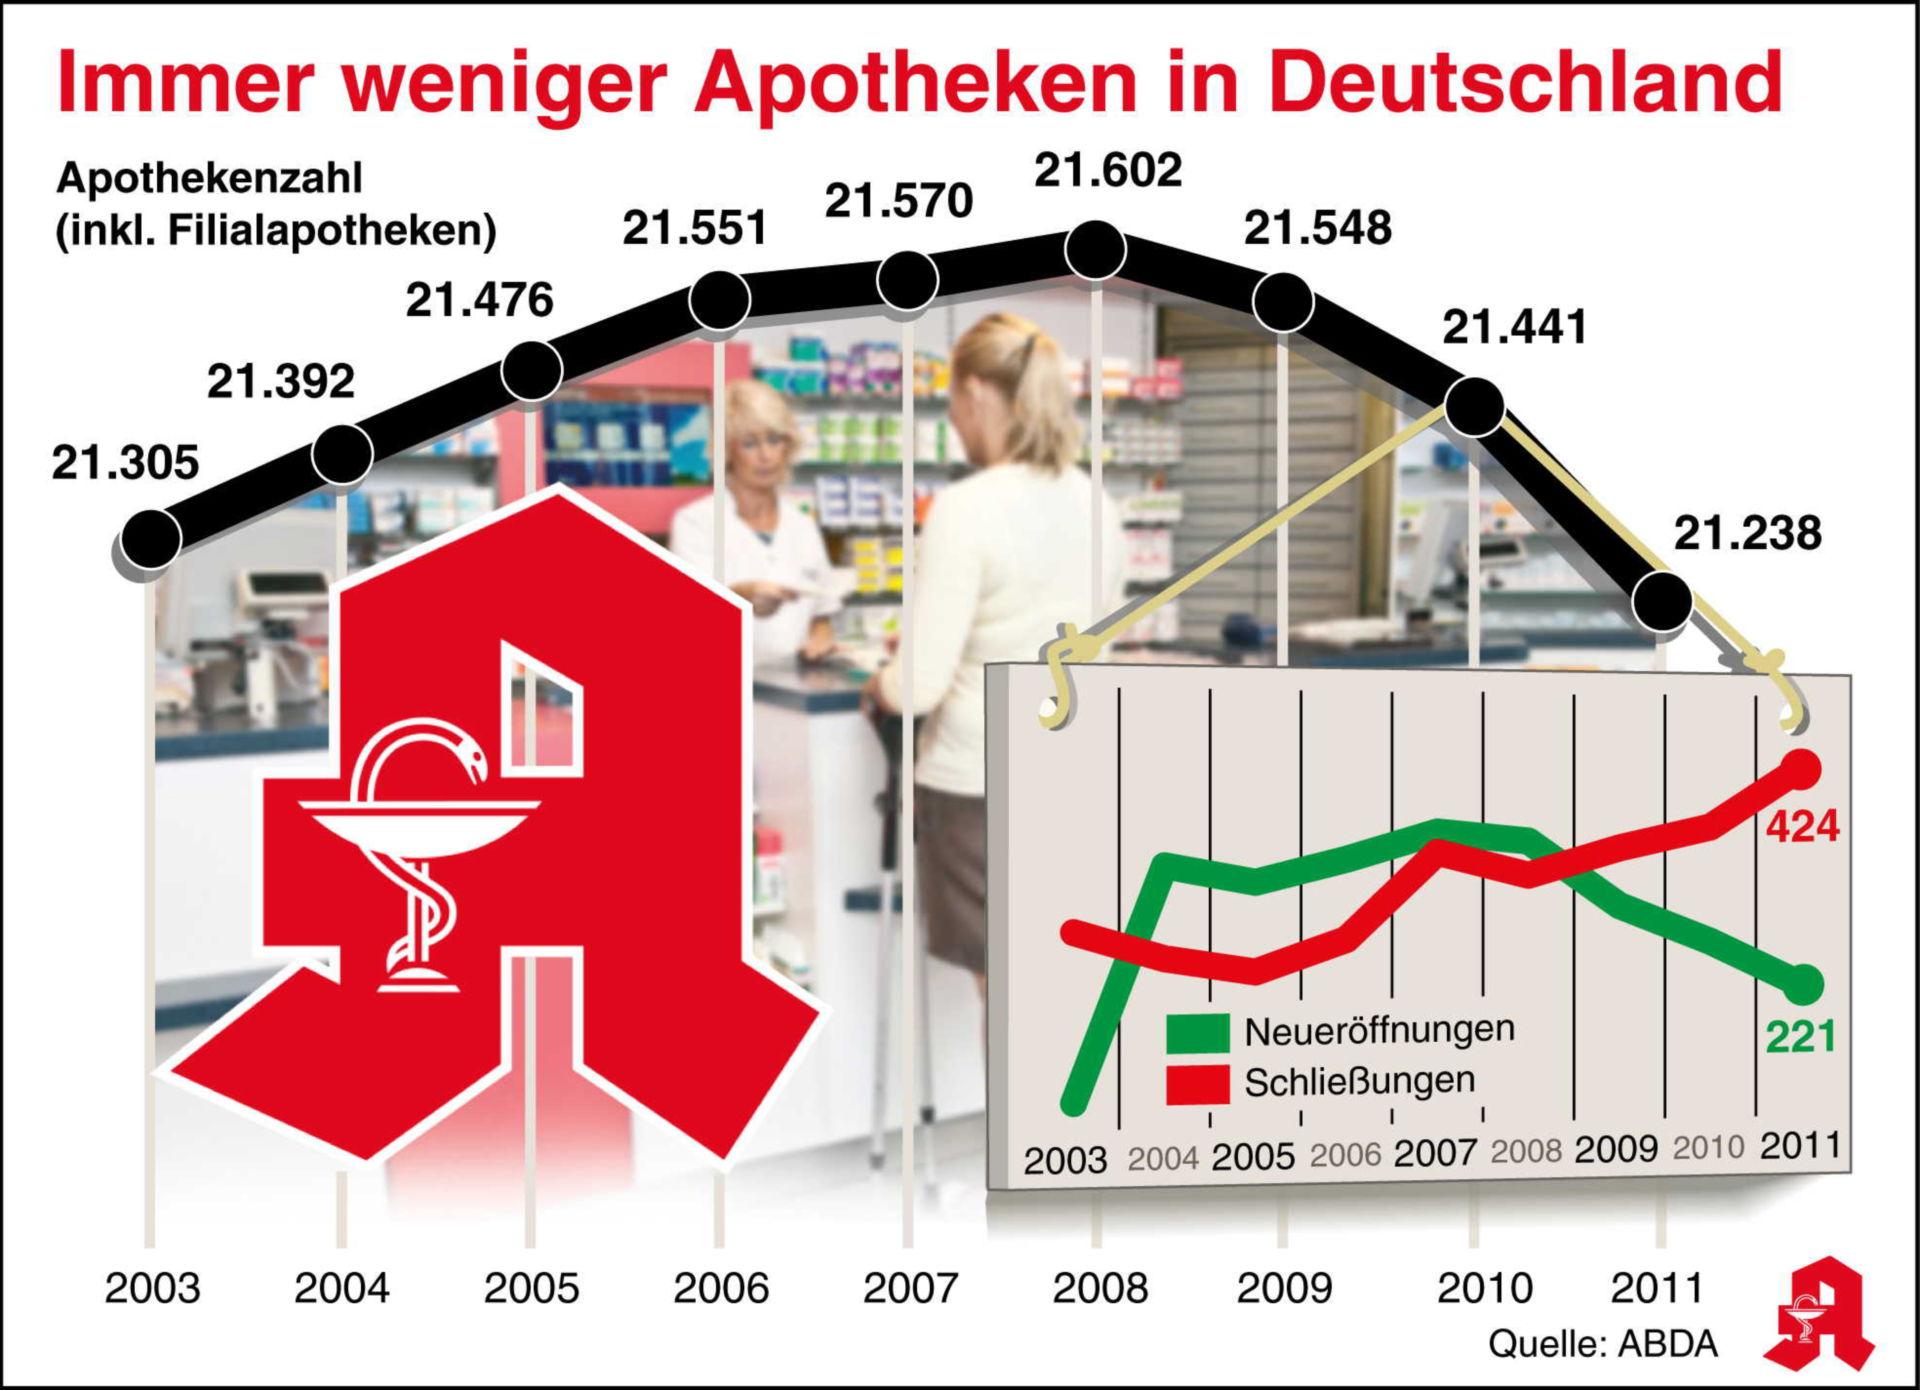 Cada vez menos farmacias en Alemania